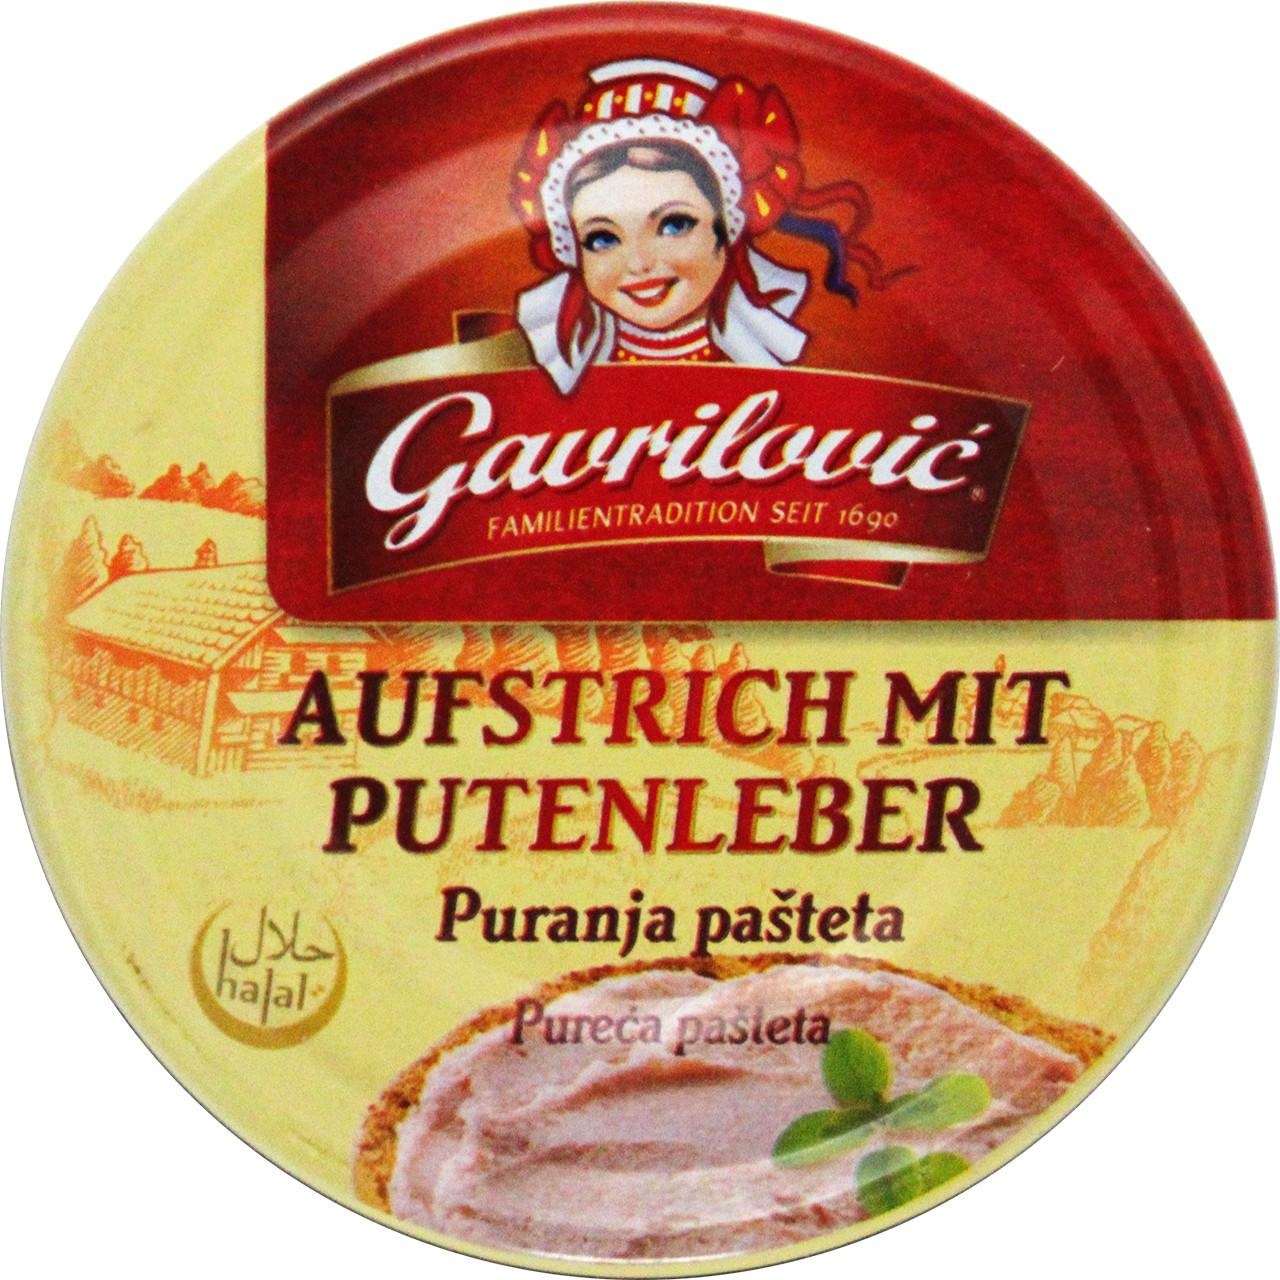 Teewurst Pastete Pute - Pureća pašteta